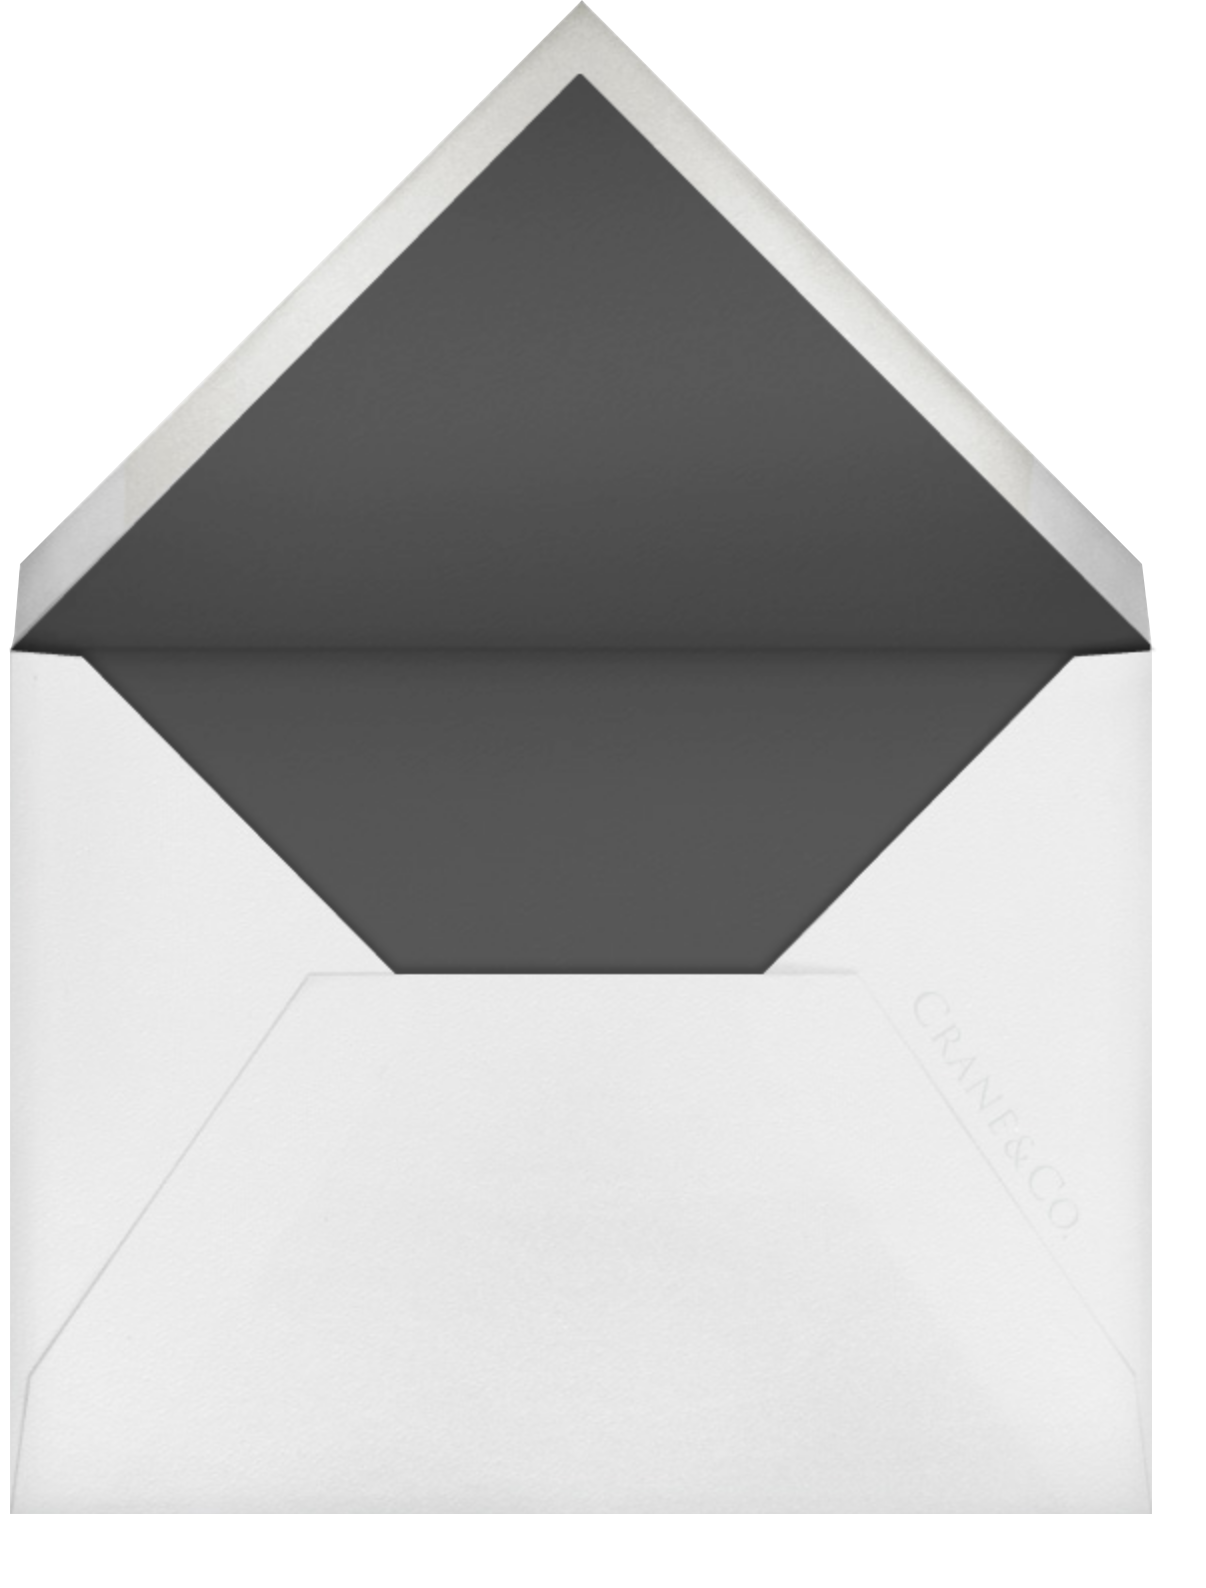 Prelude (Stationery) - Platinum - Vera Wang - Personalized stationery - envelope back